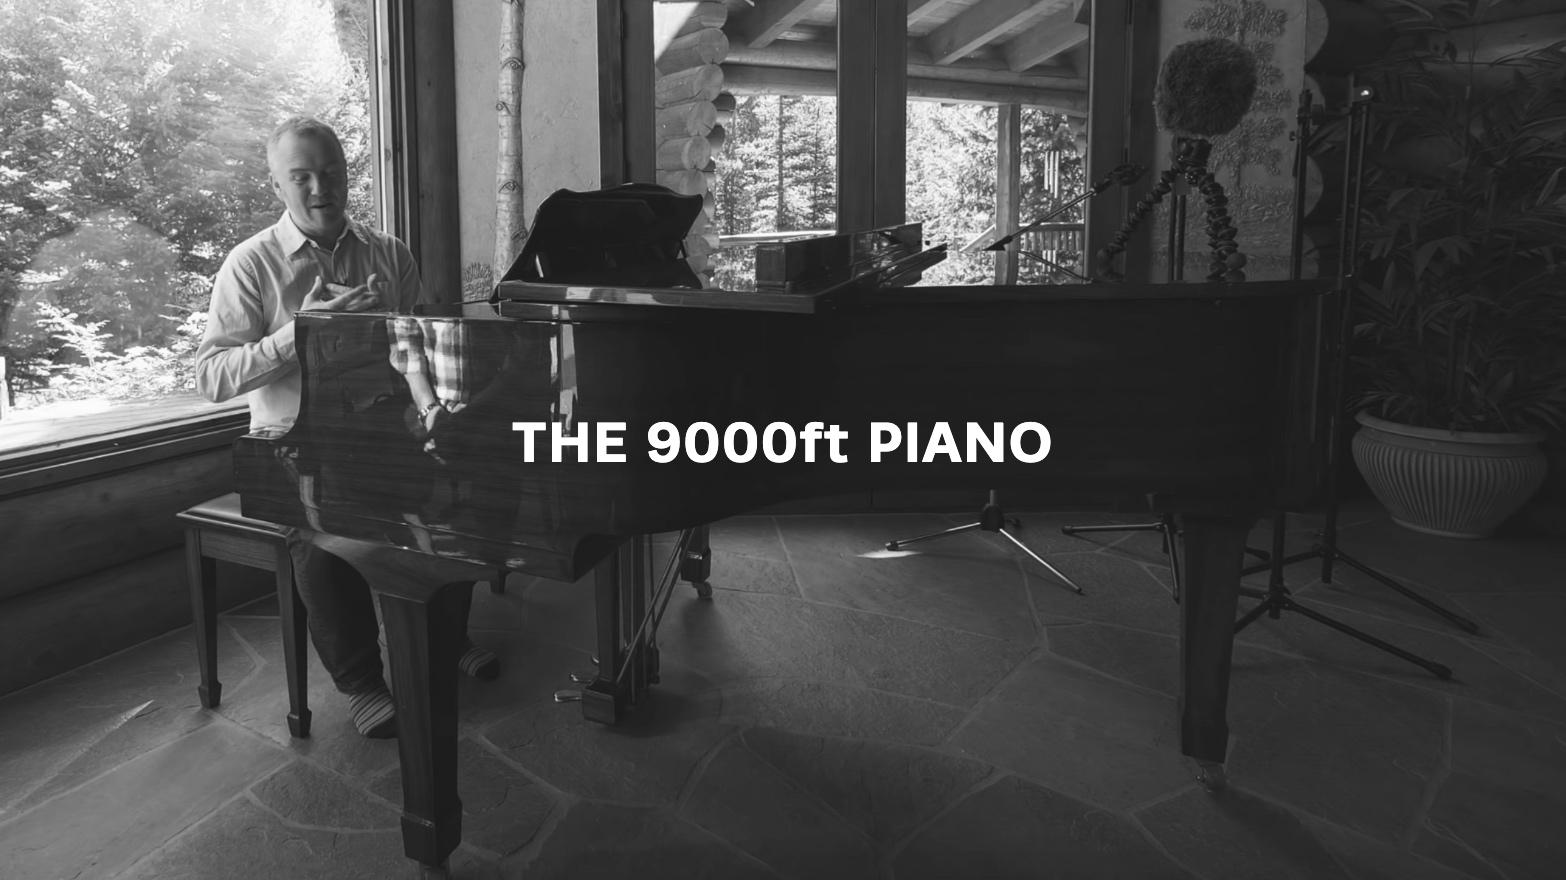 9000ft Piano Text.jpg